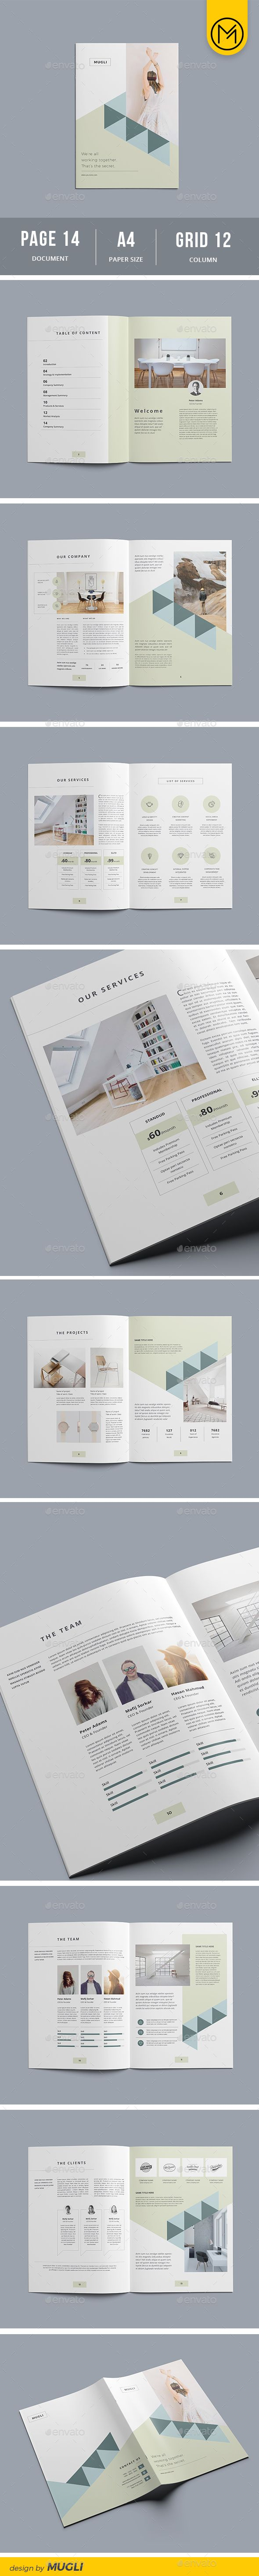 Company Profile Brochure TemplateBrochure DesignCompany ProfileAnnual